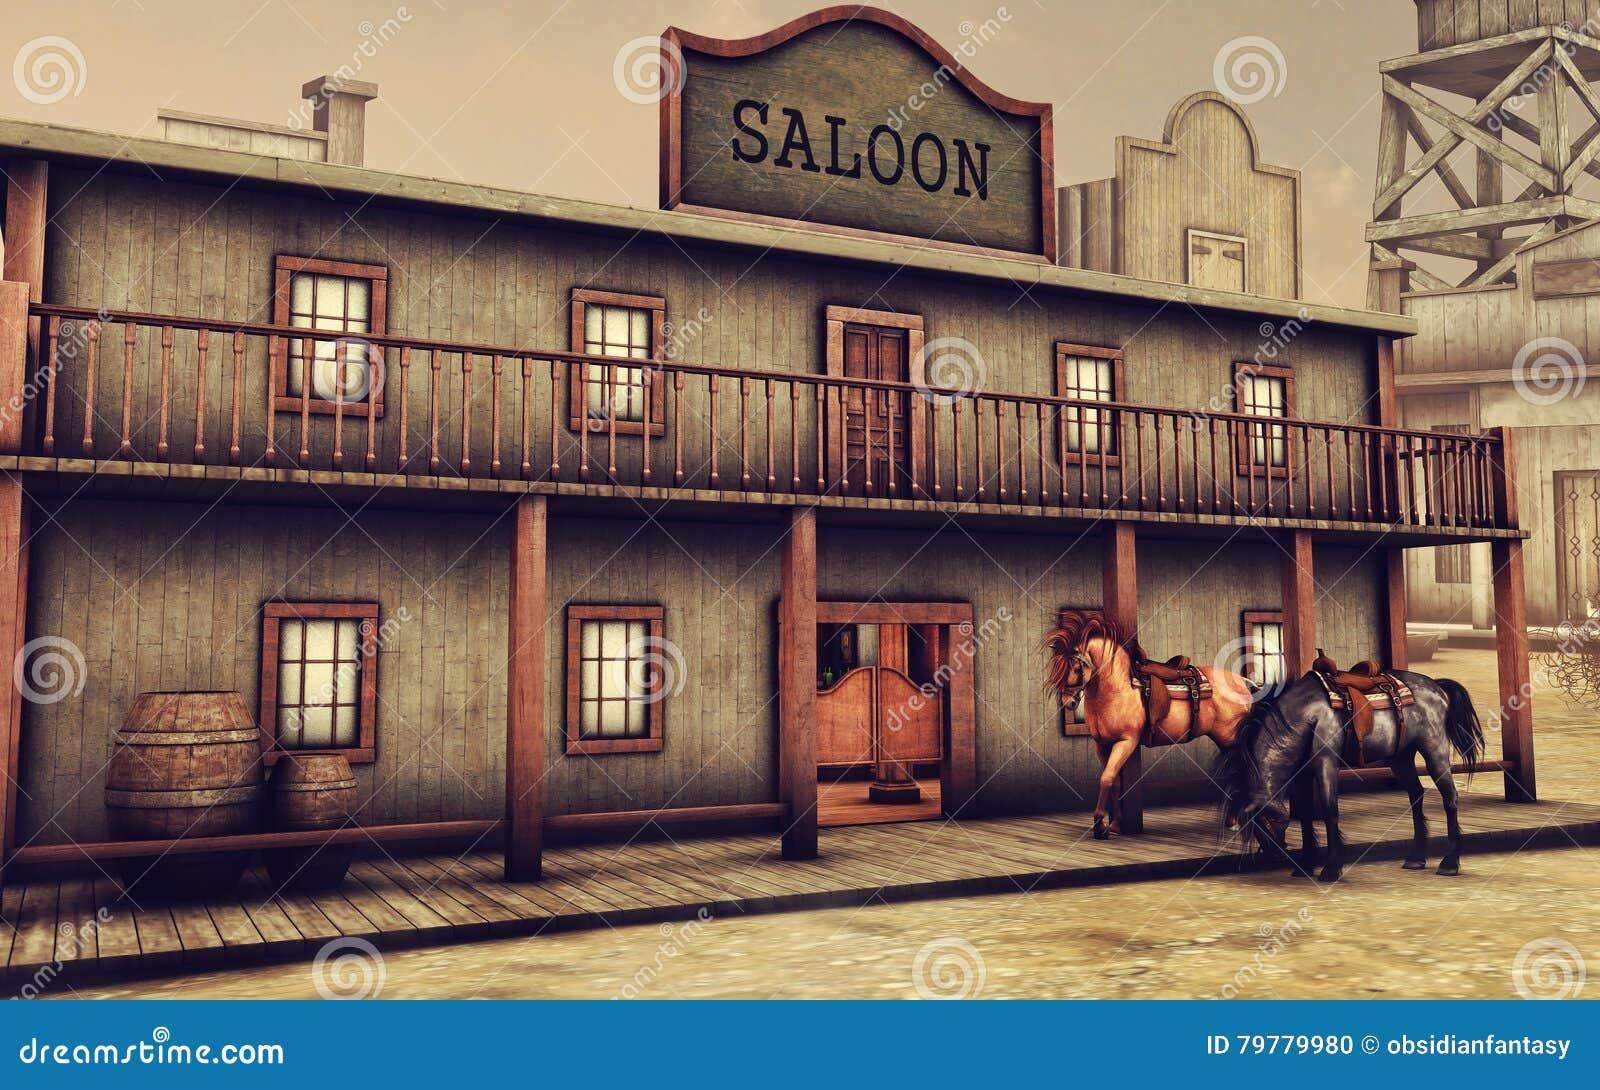 wild west saloon and horses stock illustration image 79779980. Black Bedroom Furniture Sets. Home Design Ideas